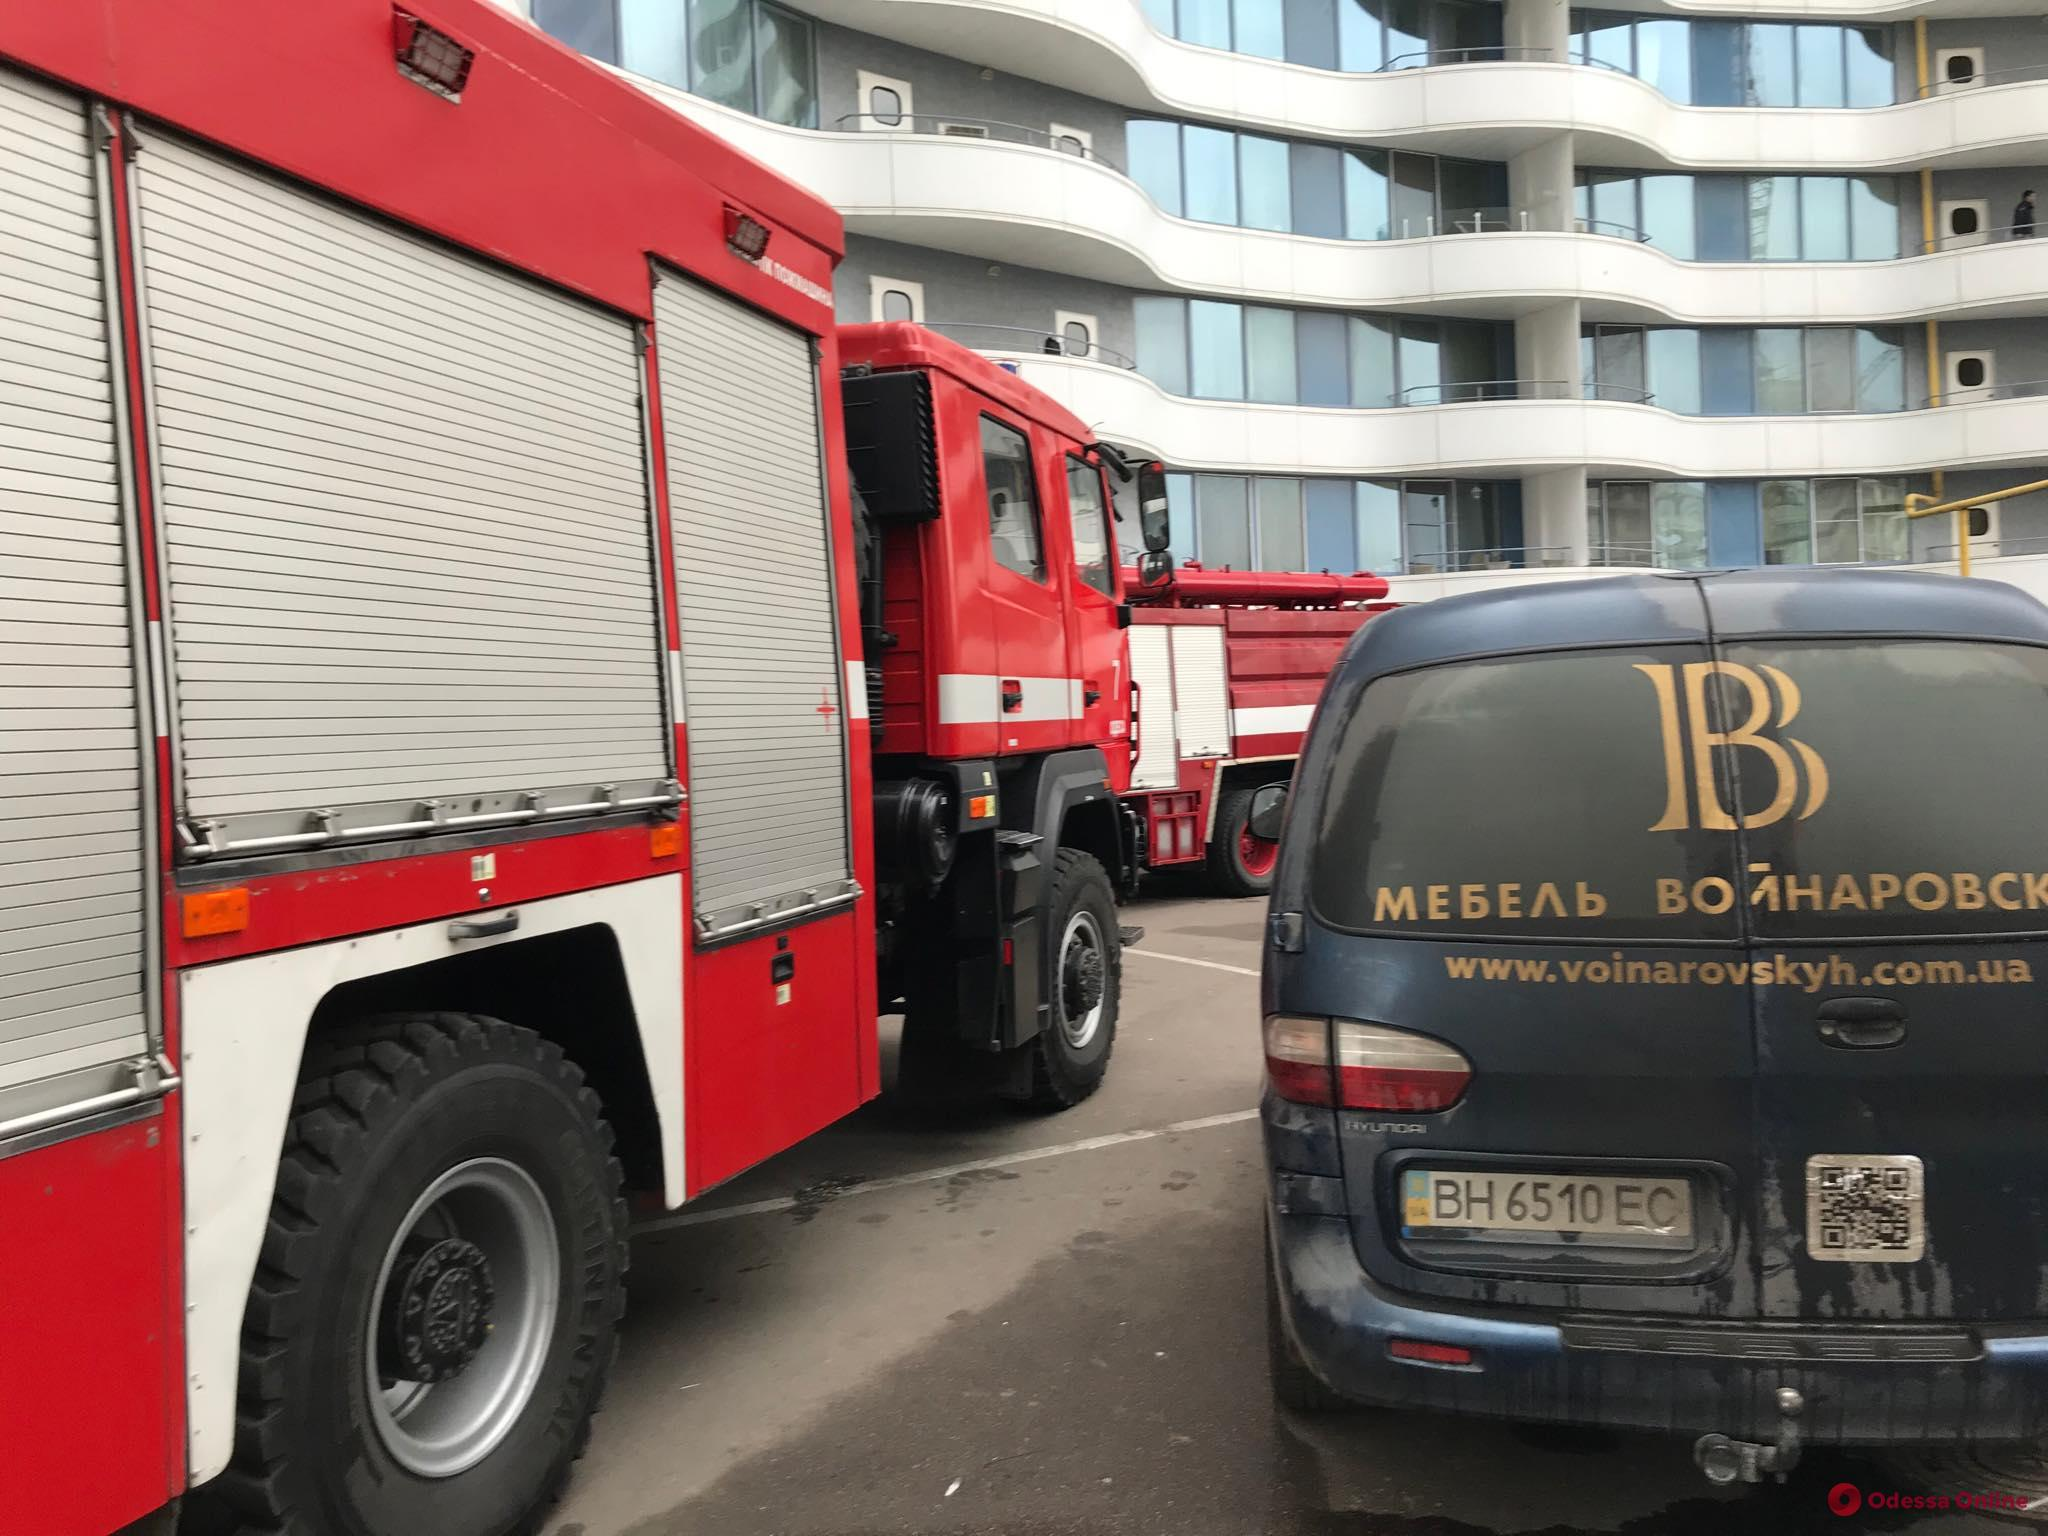 В жилом комплексе на Фонтане тушат пожар (фото, видео, обновлено)